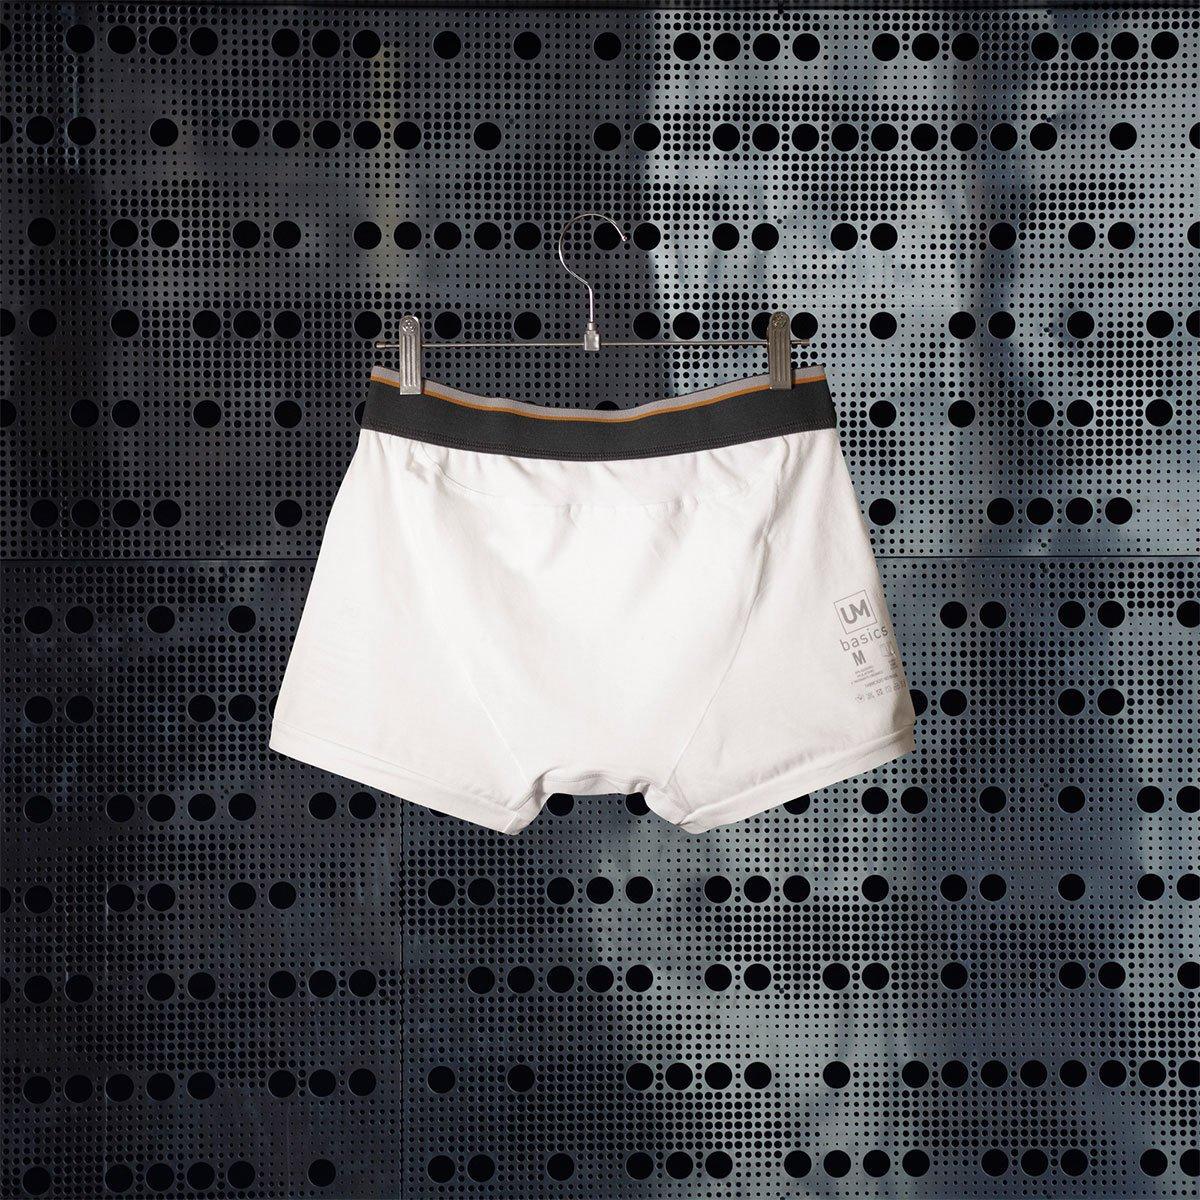 Cueca Short Boxer Branca